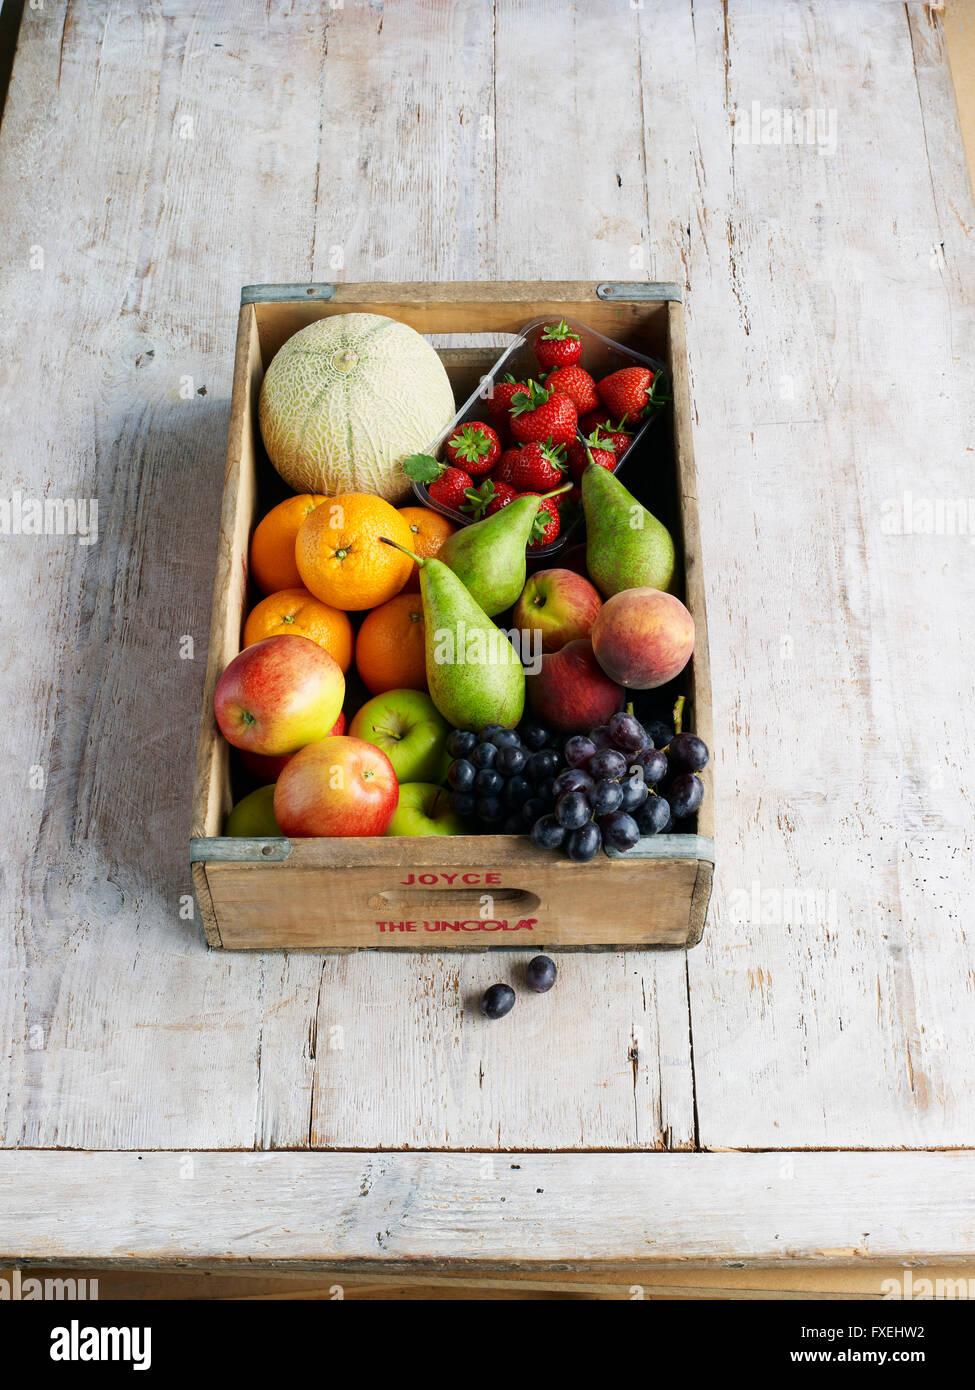 Diversas frutas en una caja de embalaje Imagen De Stock